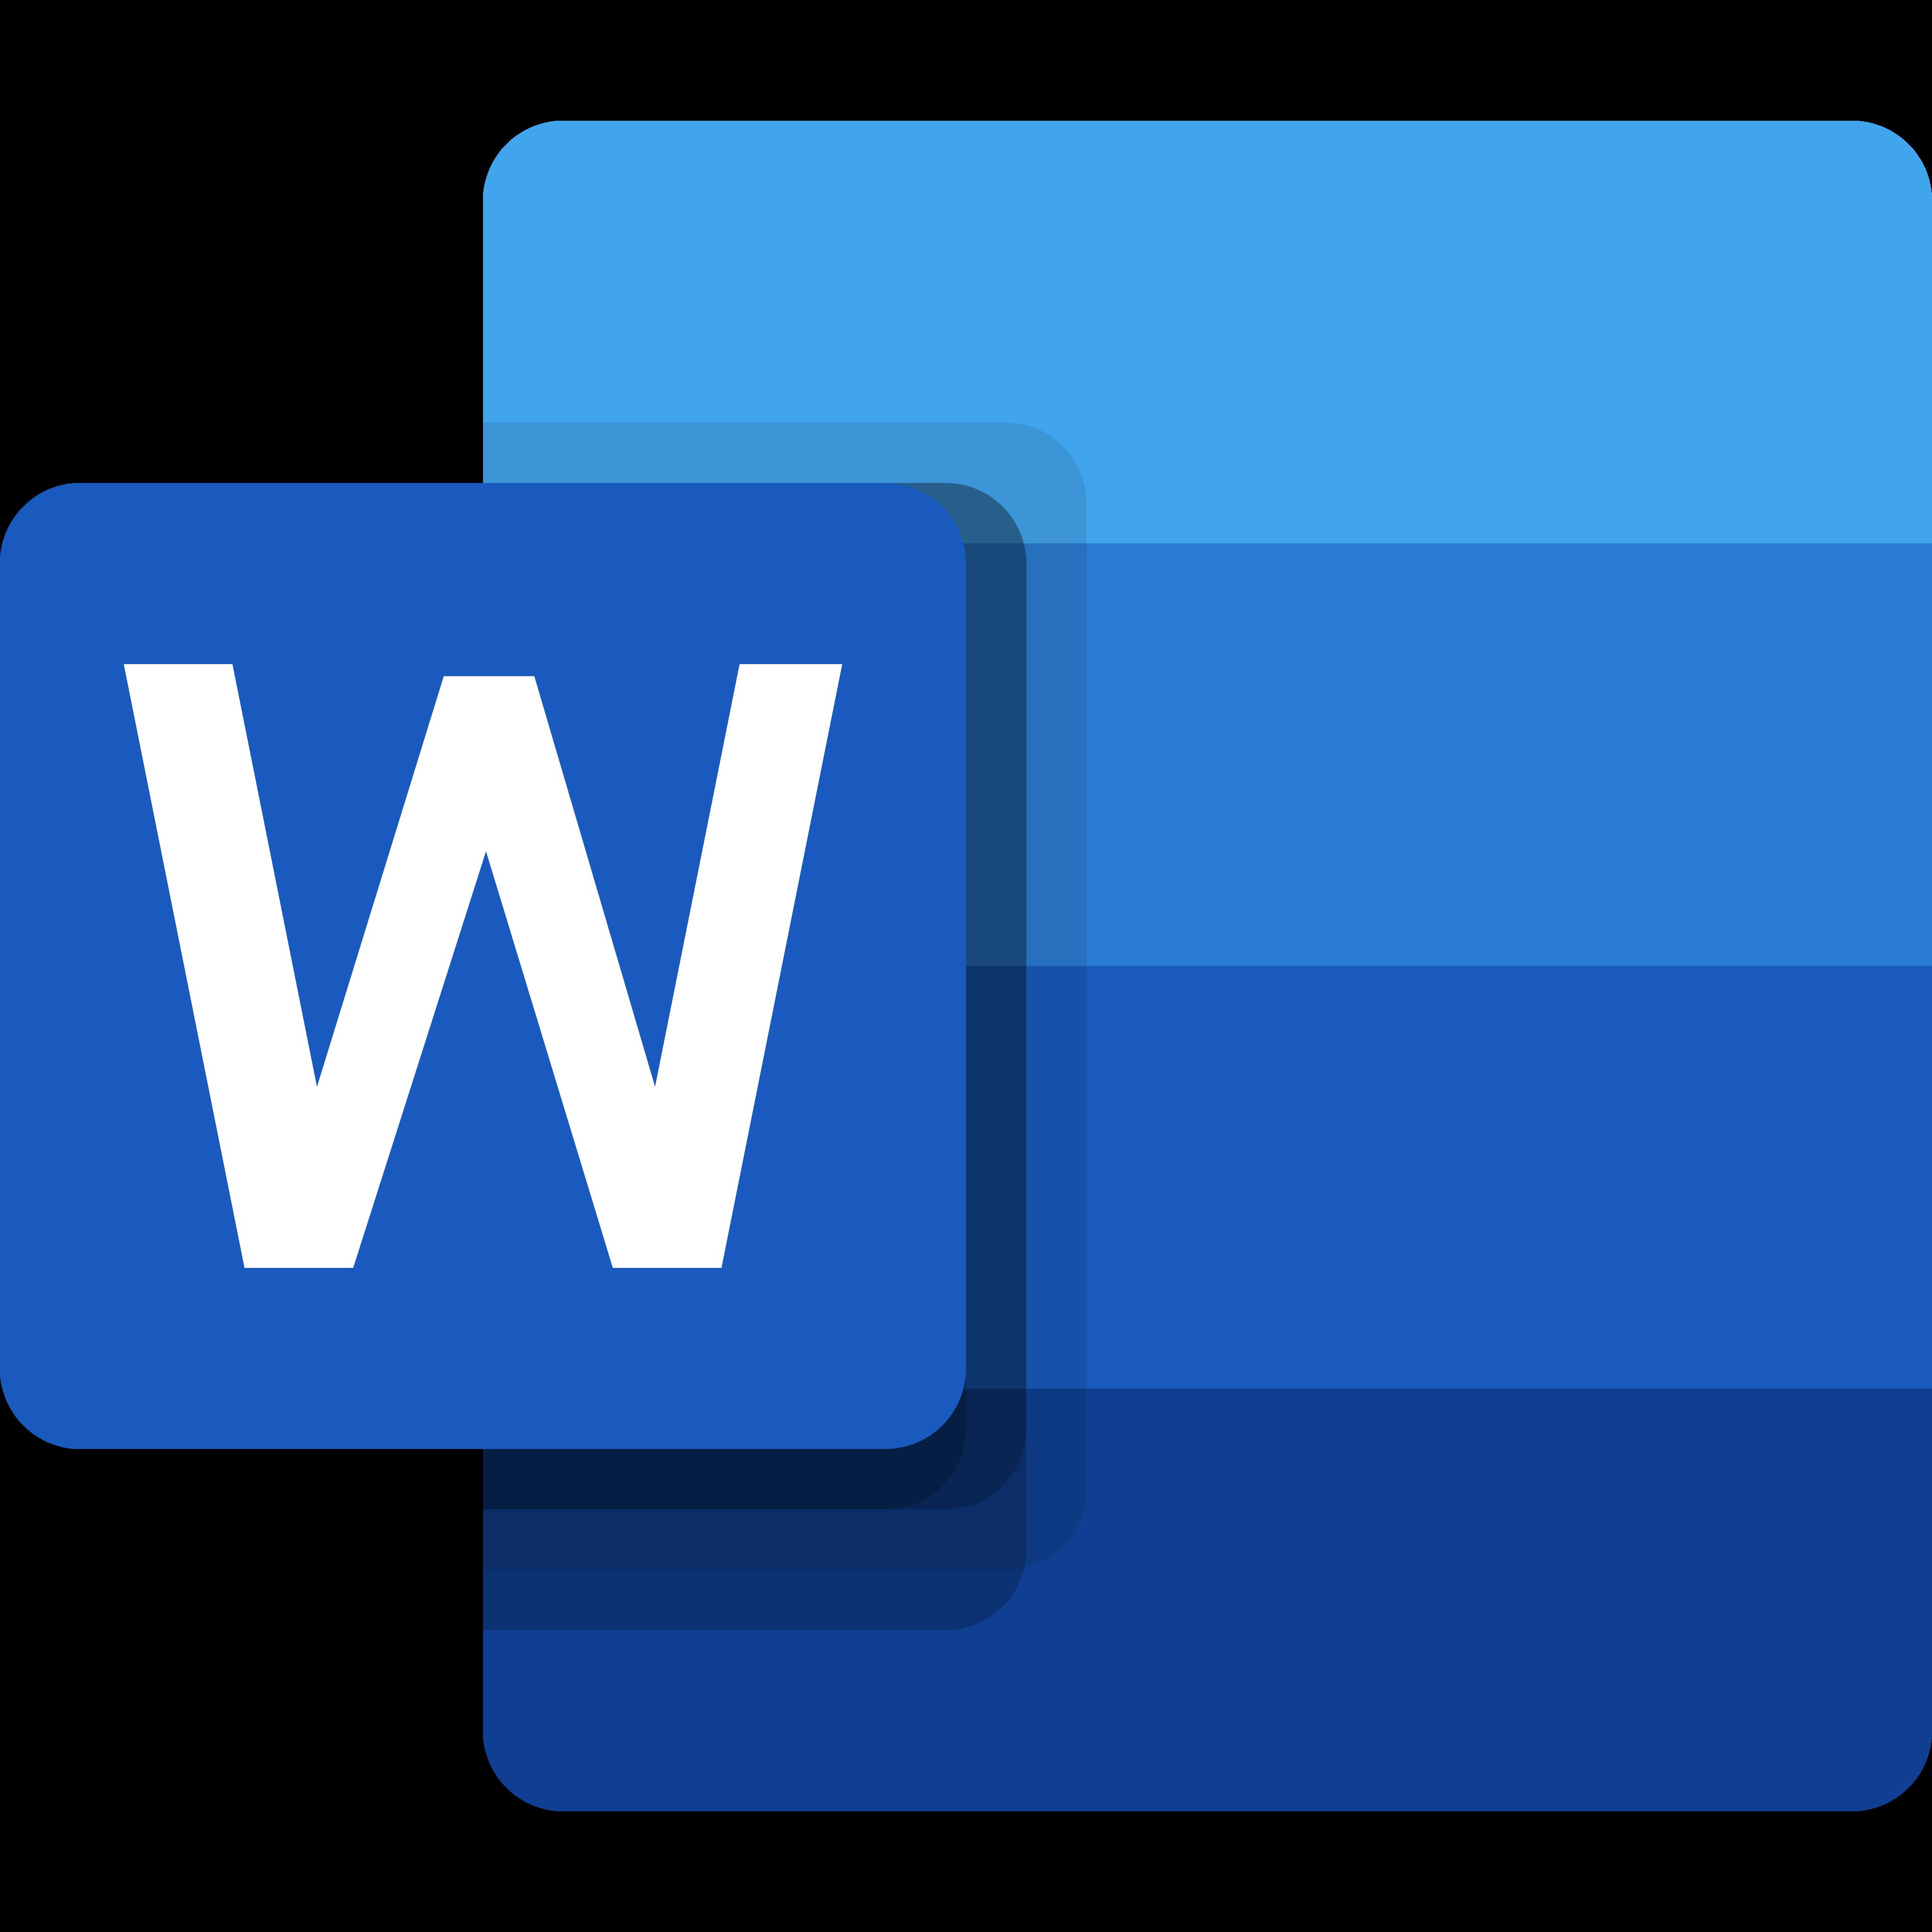 word logo 8 - Microsoft Word Logo